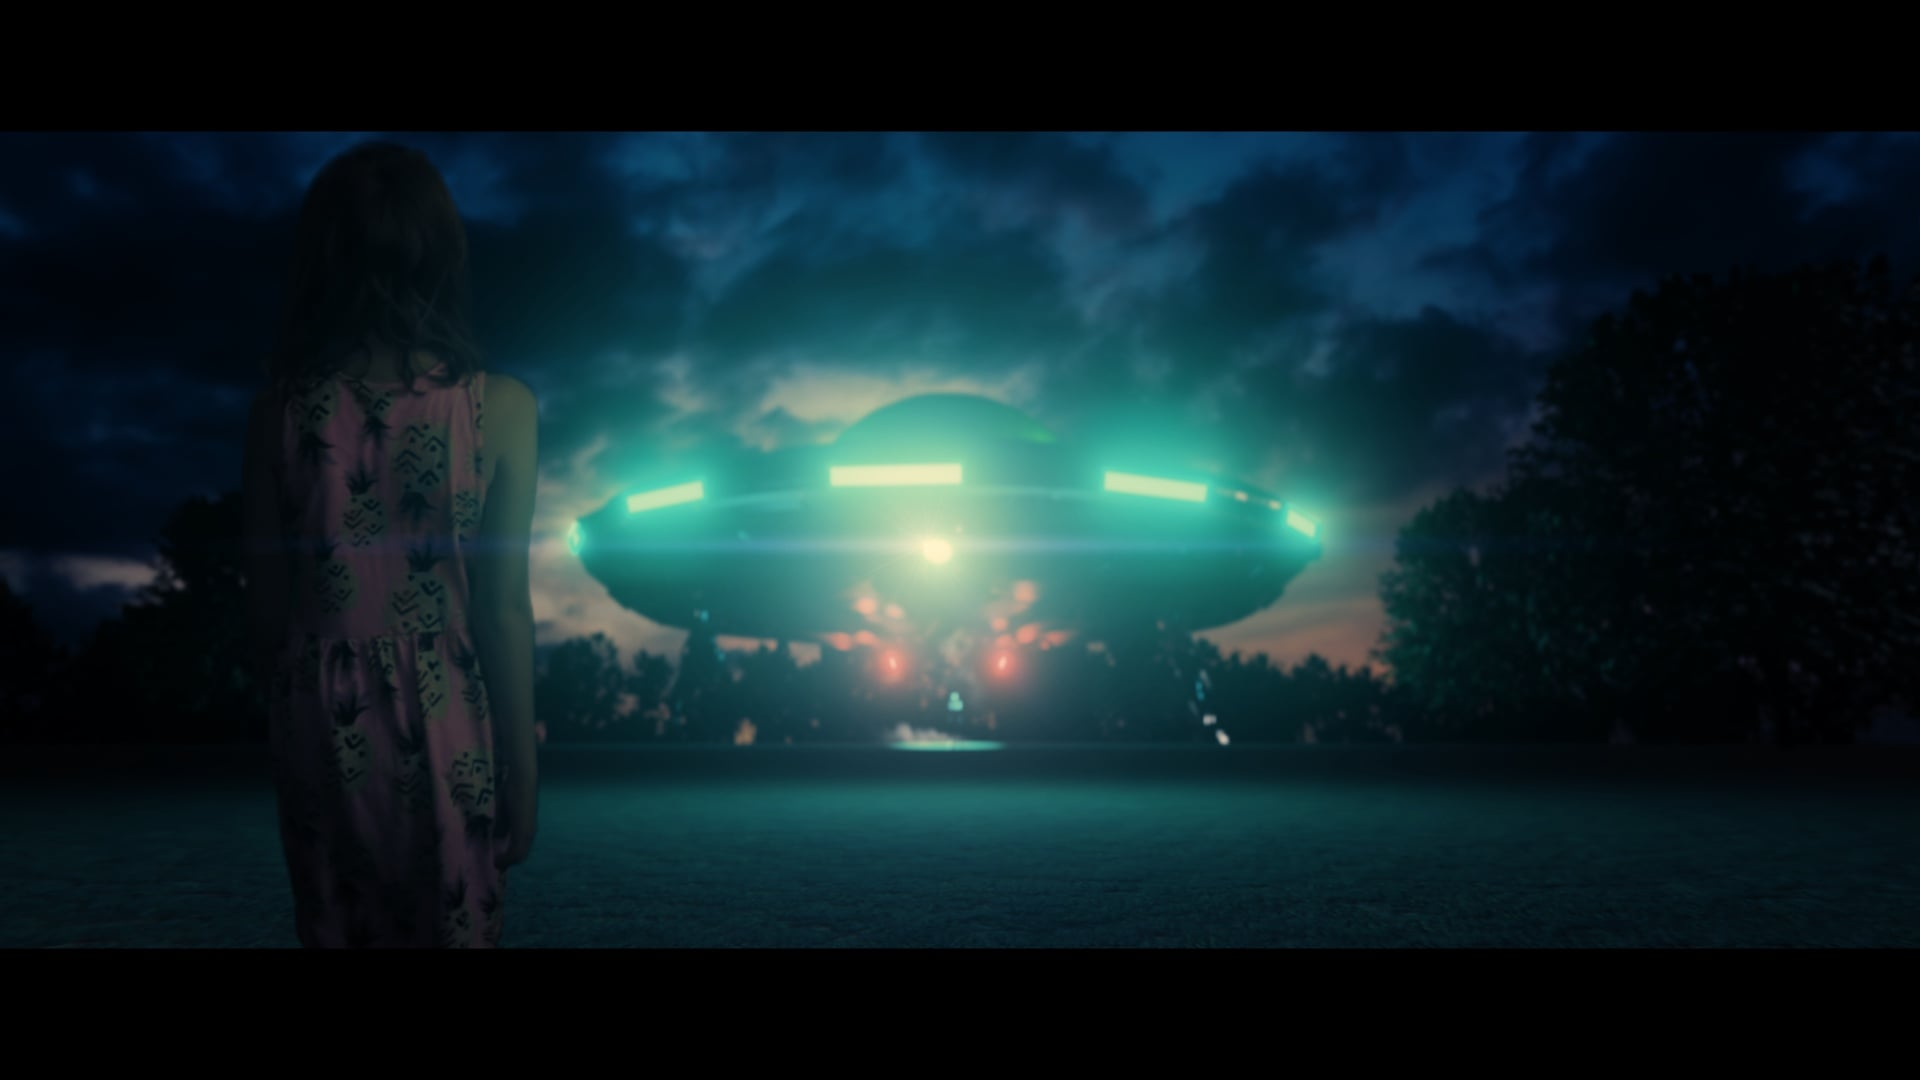 Lost Connection Sci Fi/ Comedy Short - MyRodeReel2020 entry #MyRodeReel2020 #mrr2020